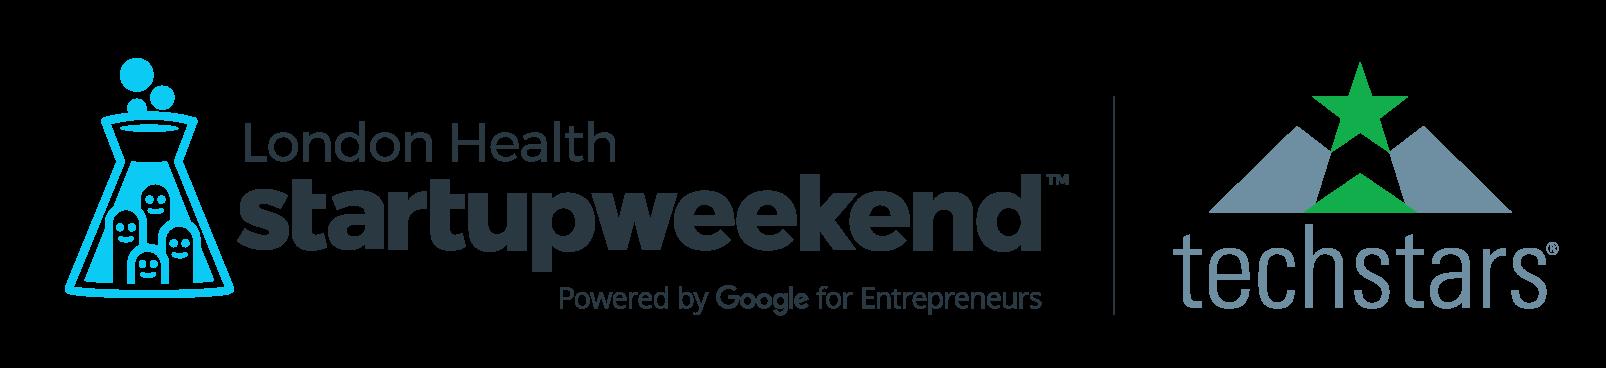 startup weekend health london